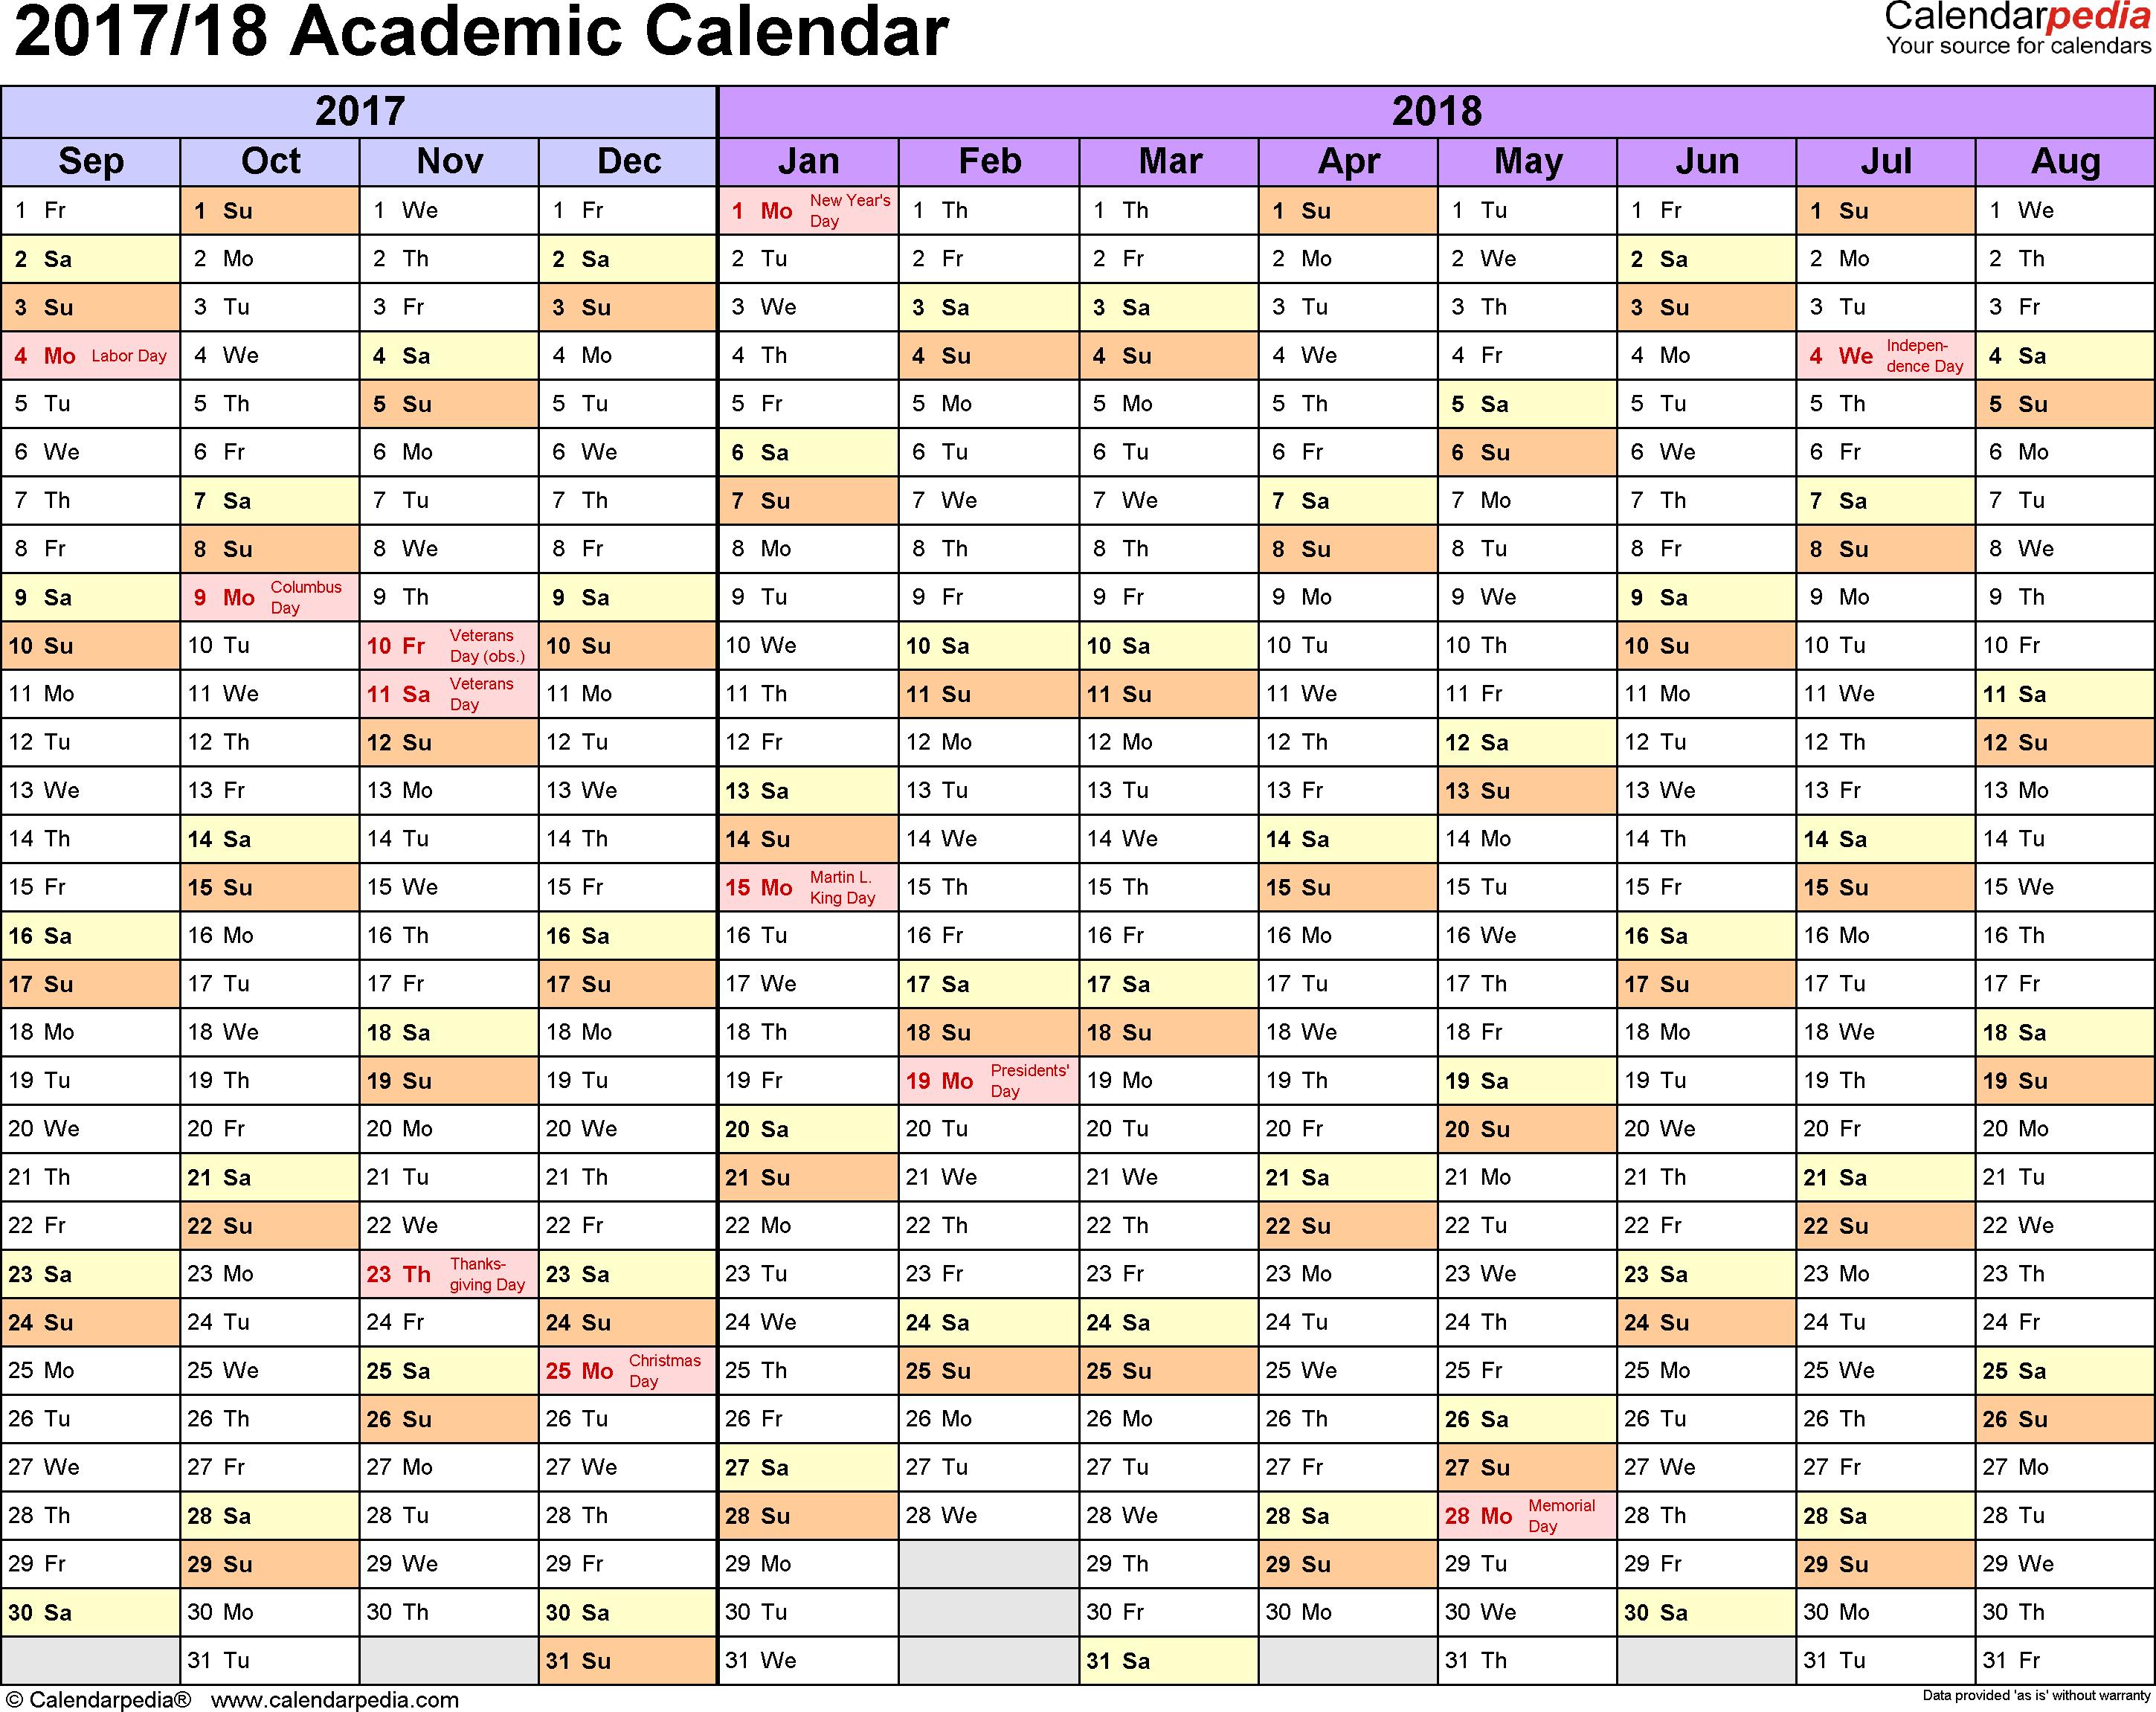 Academic Calendars 2017/2018 - Free Printable Excel Templates inside Template Academic Calendar With Notes